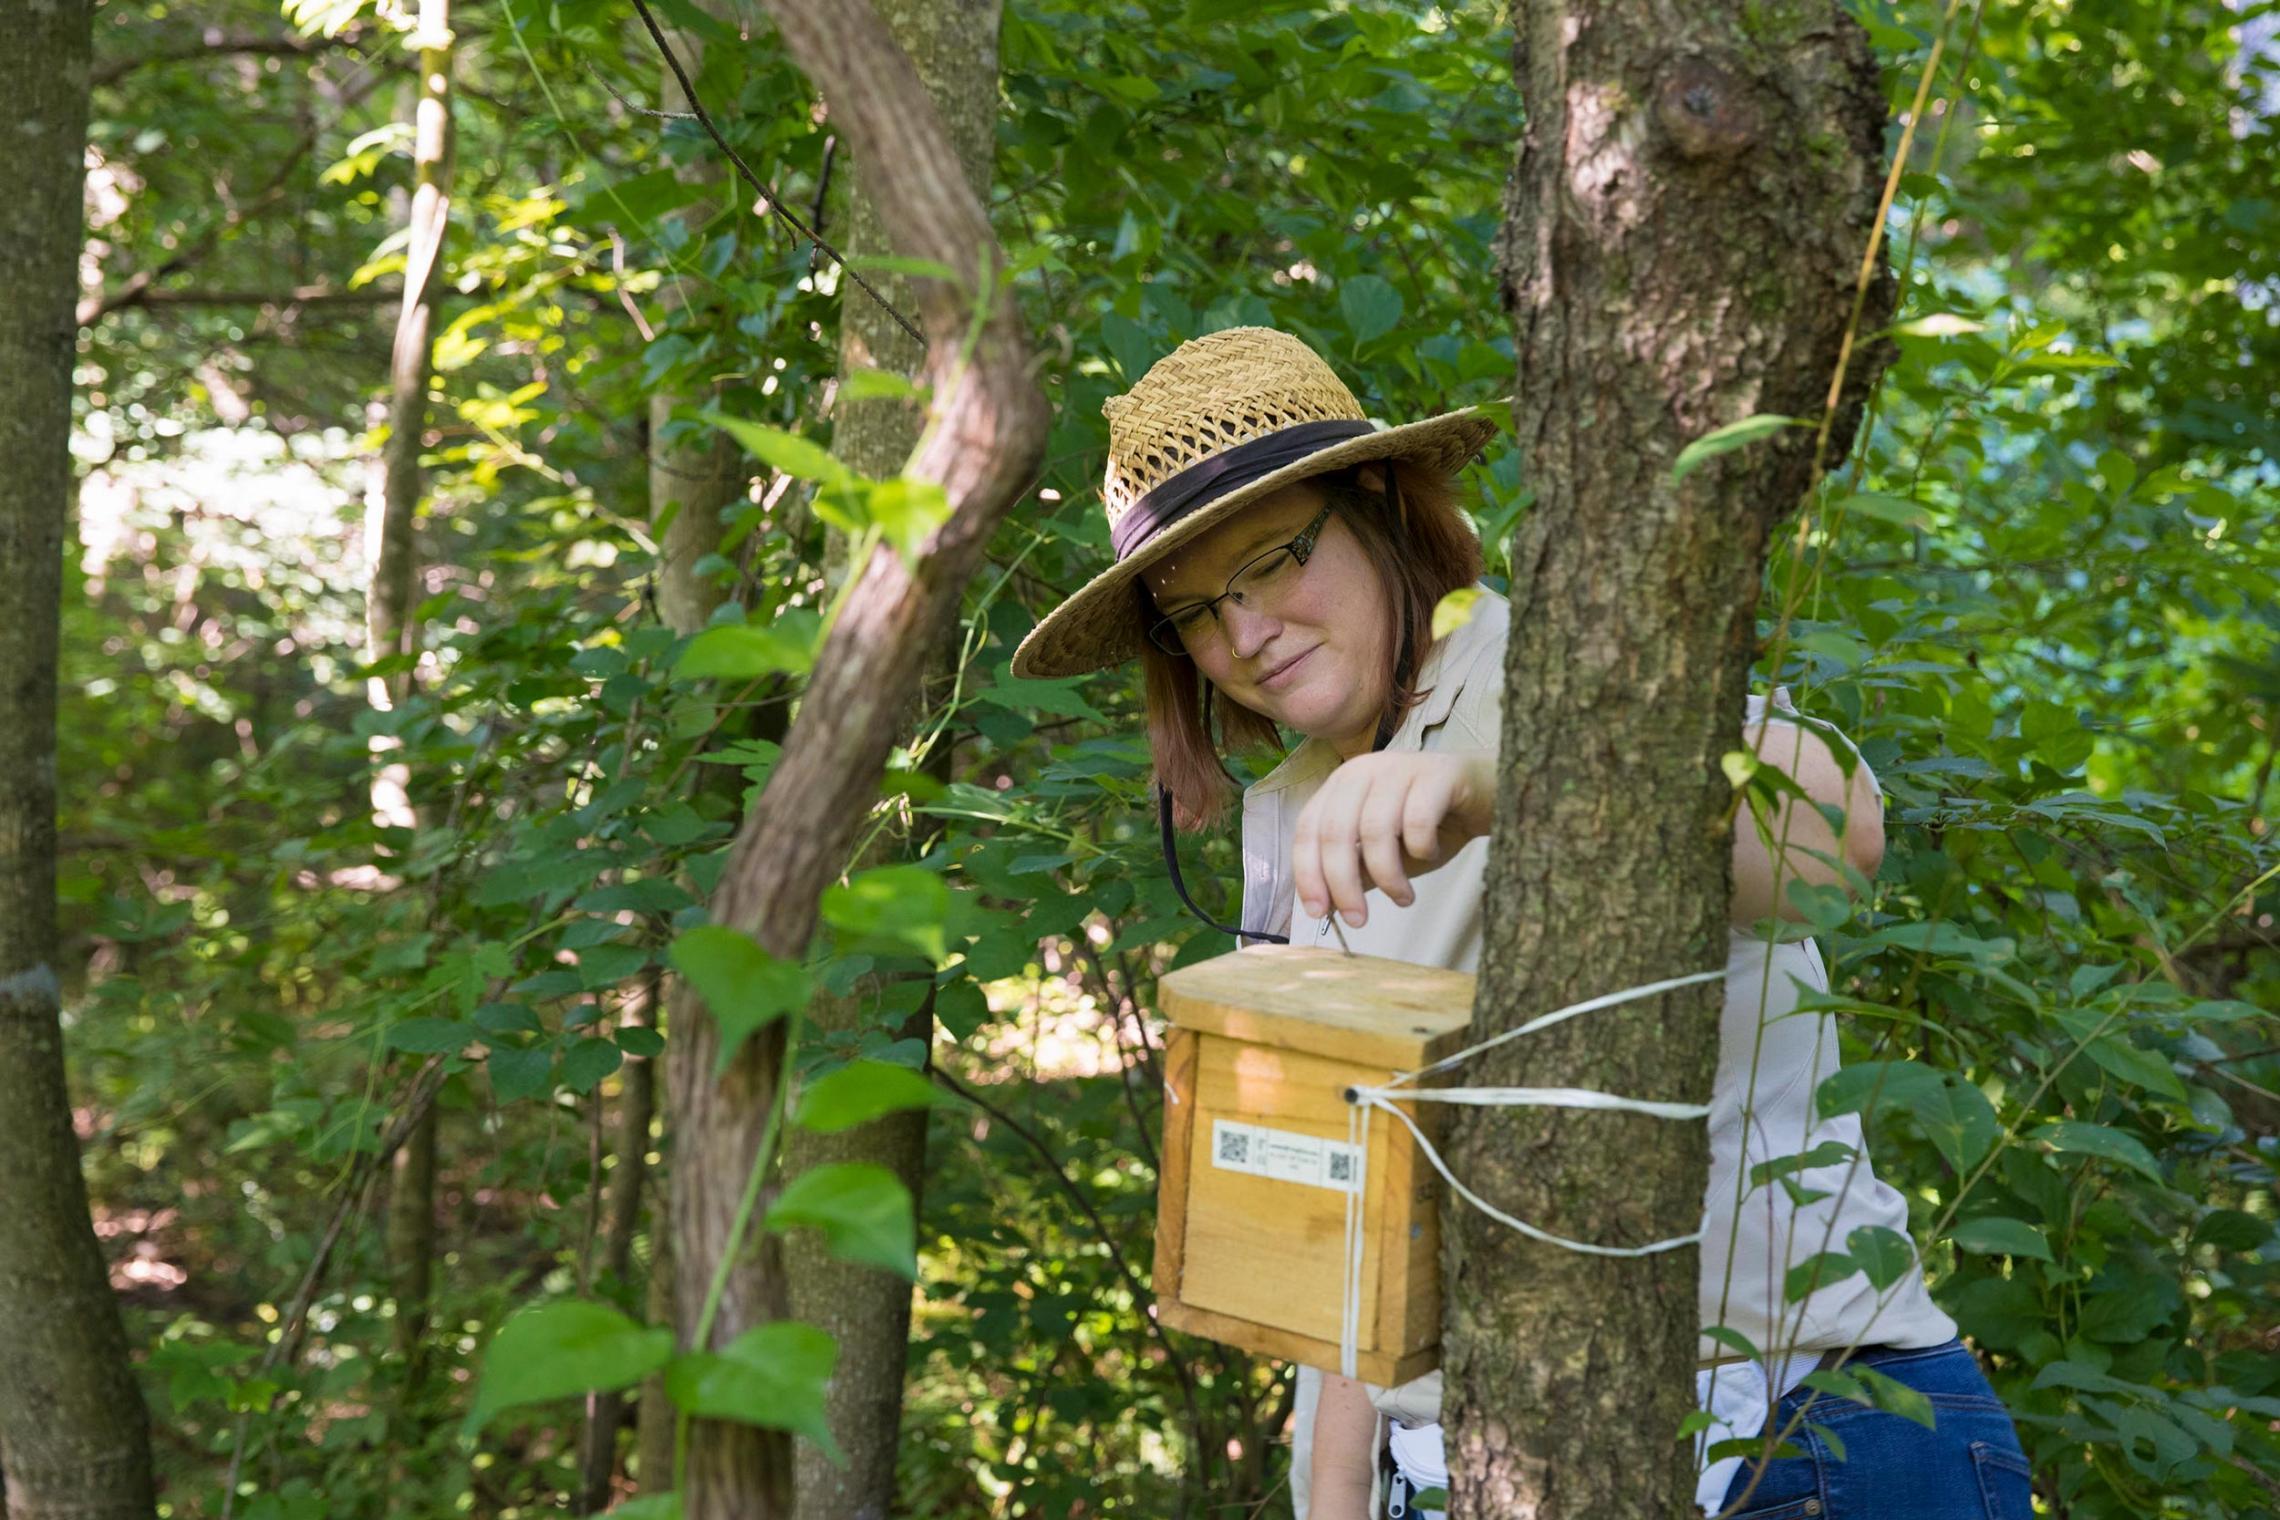 Environmental sciences Ph.D. candidate Amber Slatosky checks a bumblebee nesting box in McIntire Botanical Garden. (Photo by Dan Addison, University Communications)